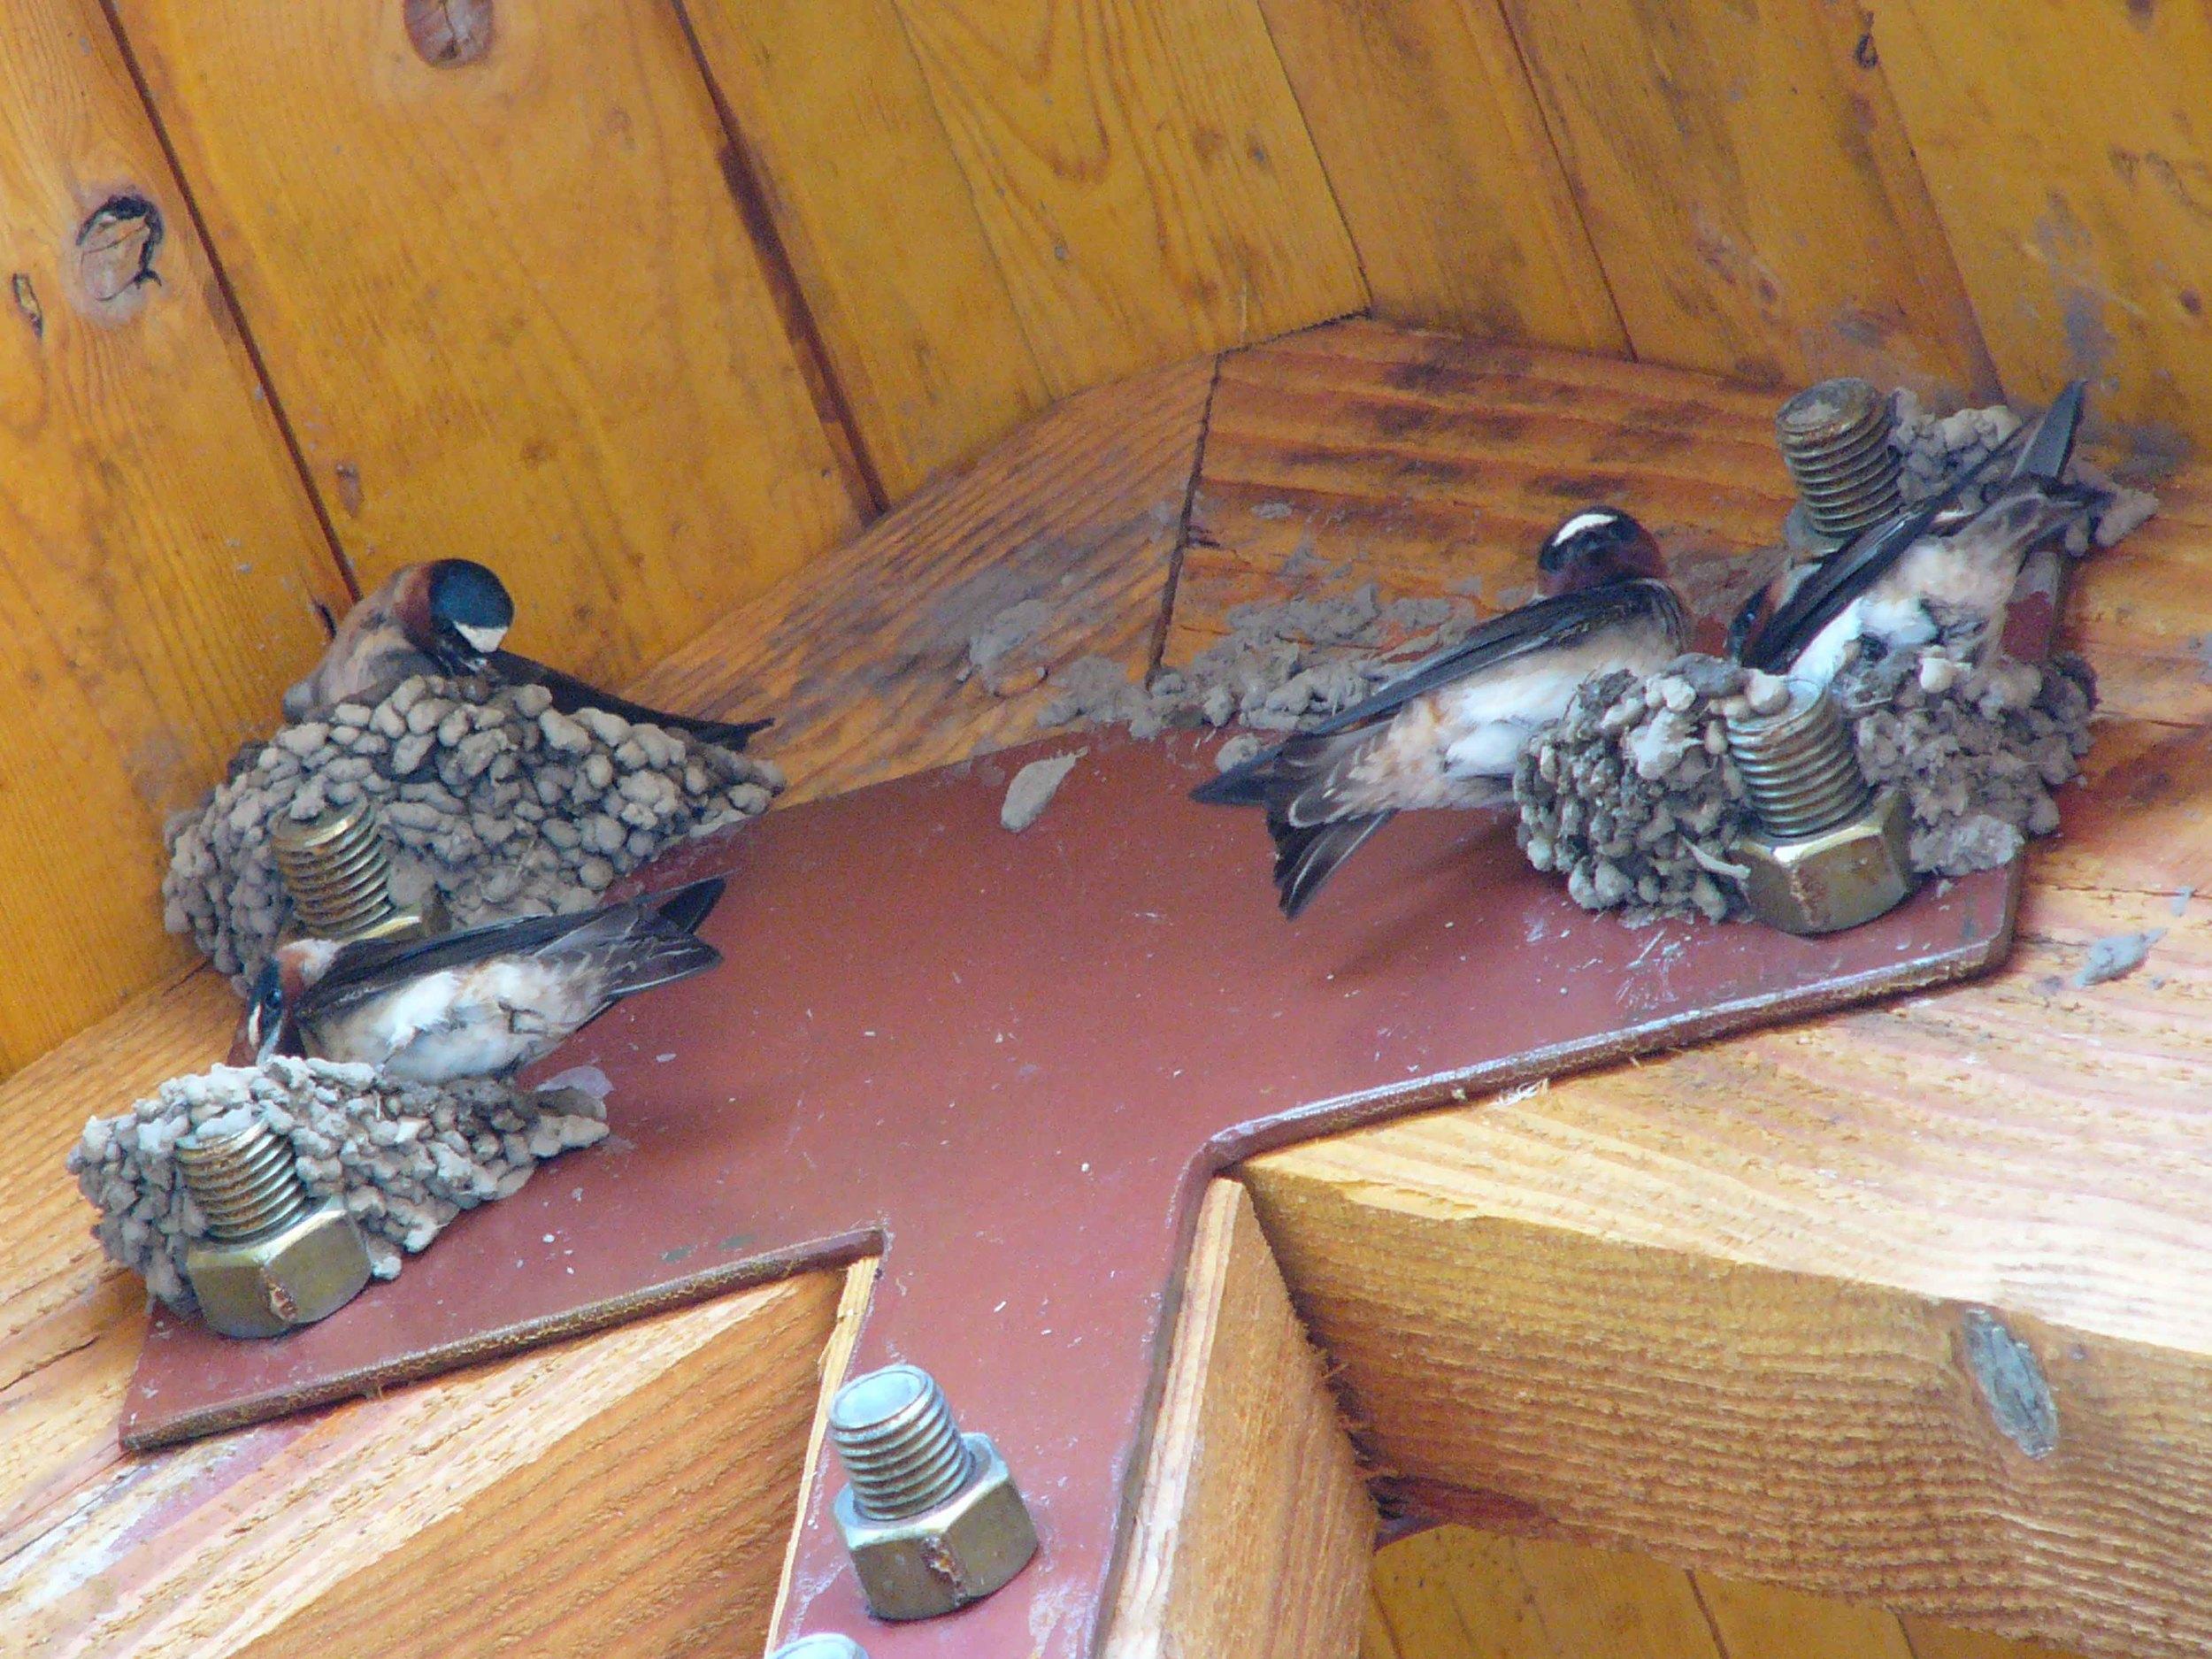 bcs P1010035 Cliff Swallows nest building.jpg